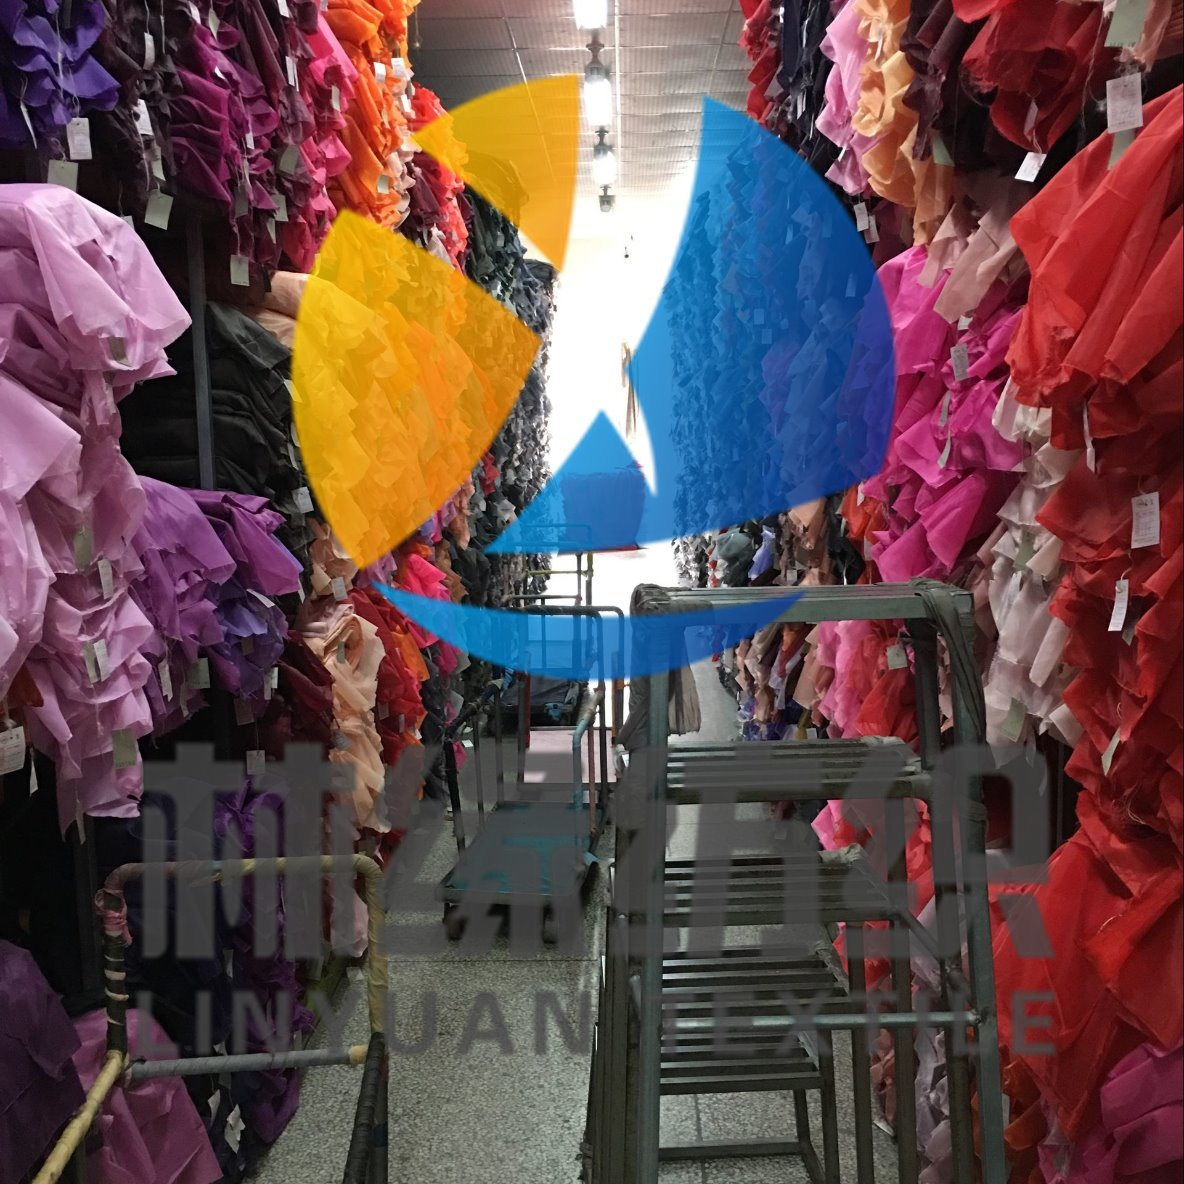 Polyester Fabric, 190t 210t Taffeta Fabric, Lining Fabric, Wholesale Fabric, Garment Fabric (2)